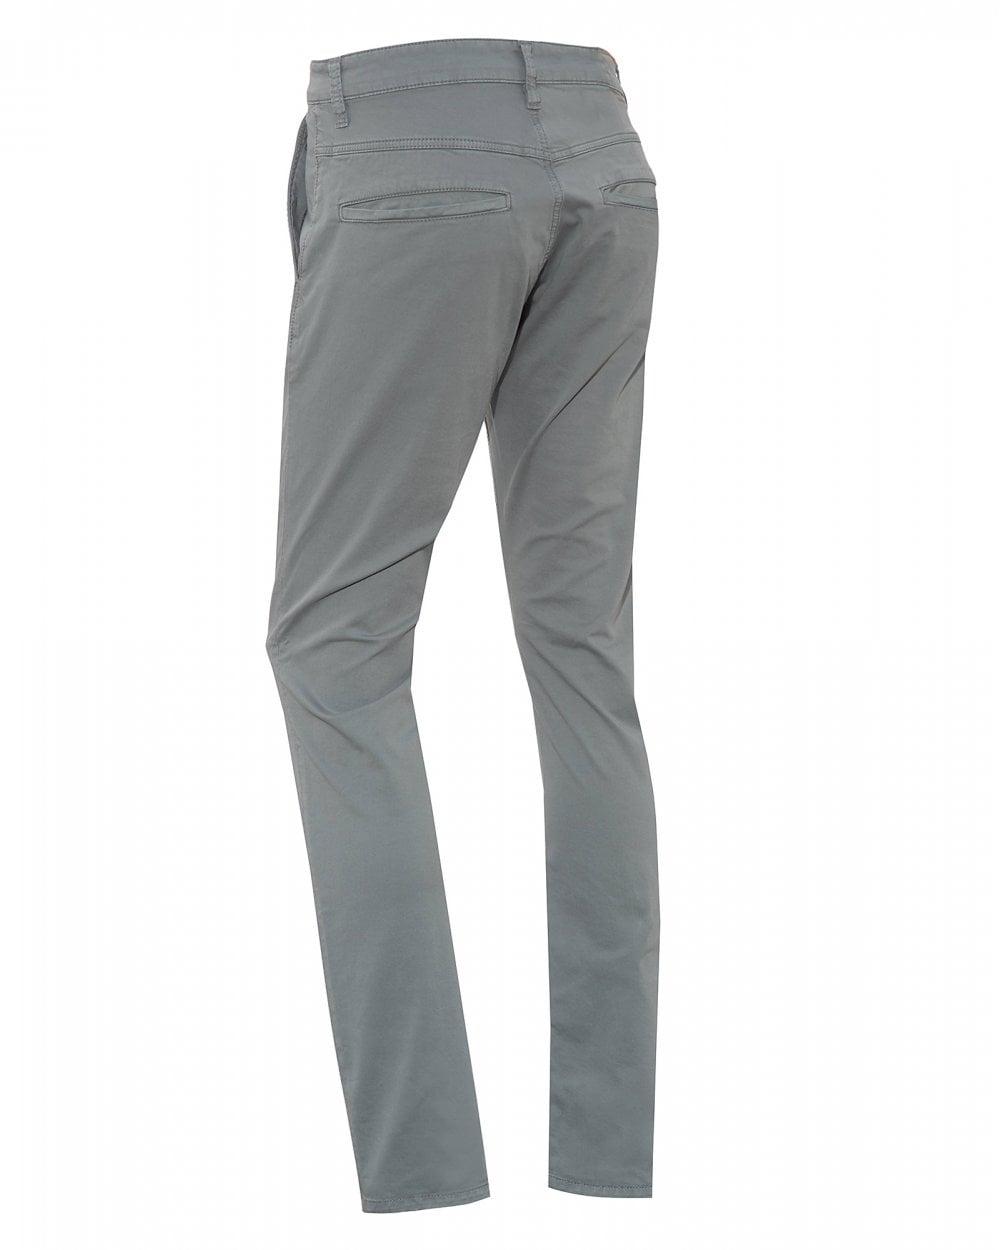 d4fe9c42501 Nudie Jeans Mens Slim Adam Chinos, Ash Grey Trousers